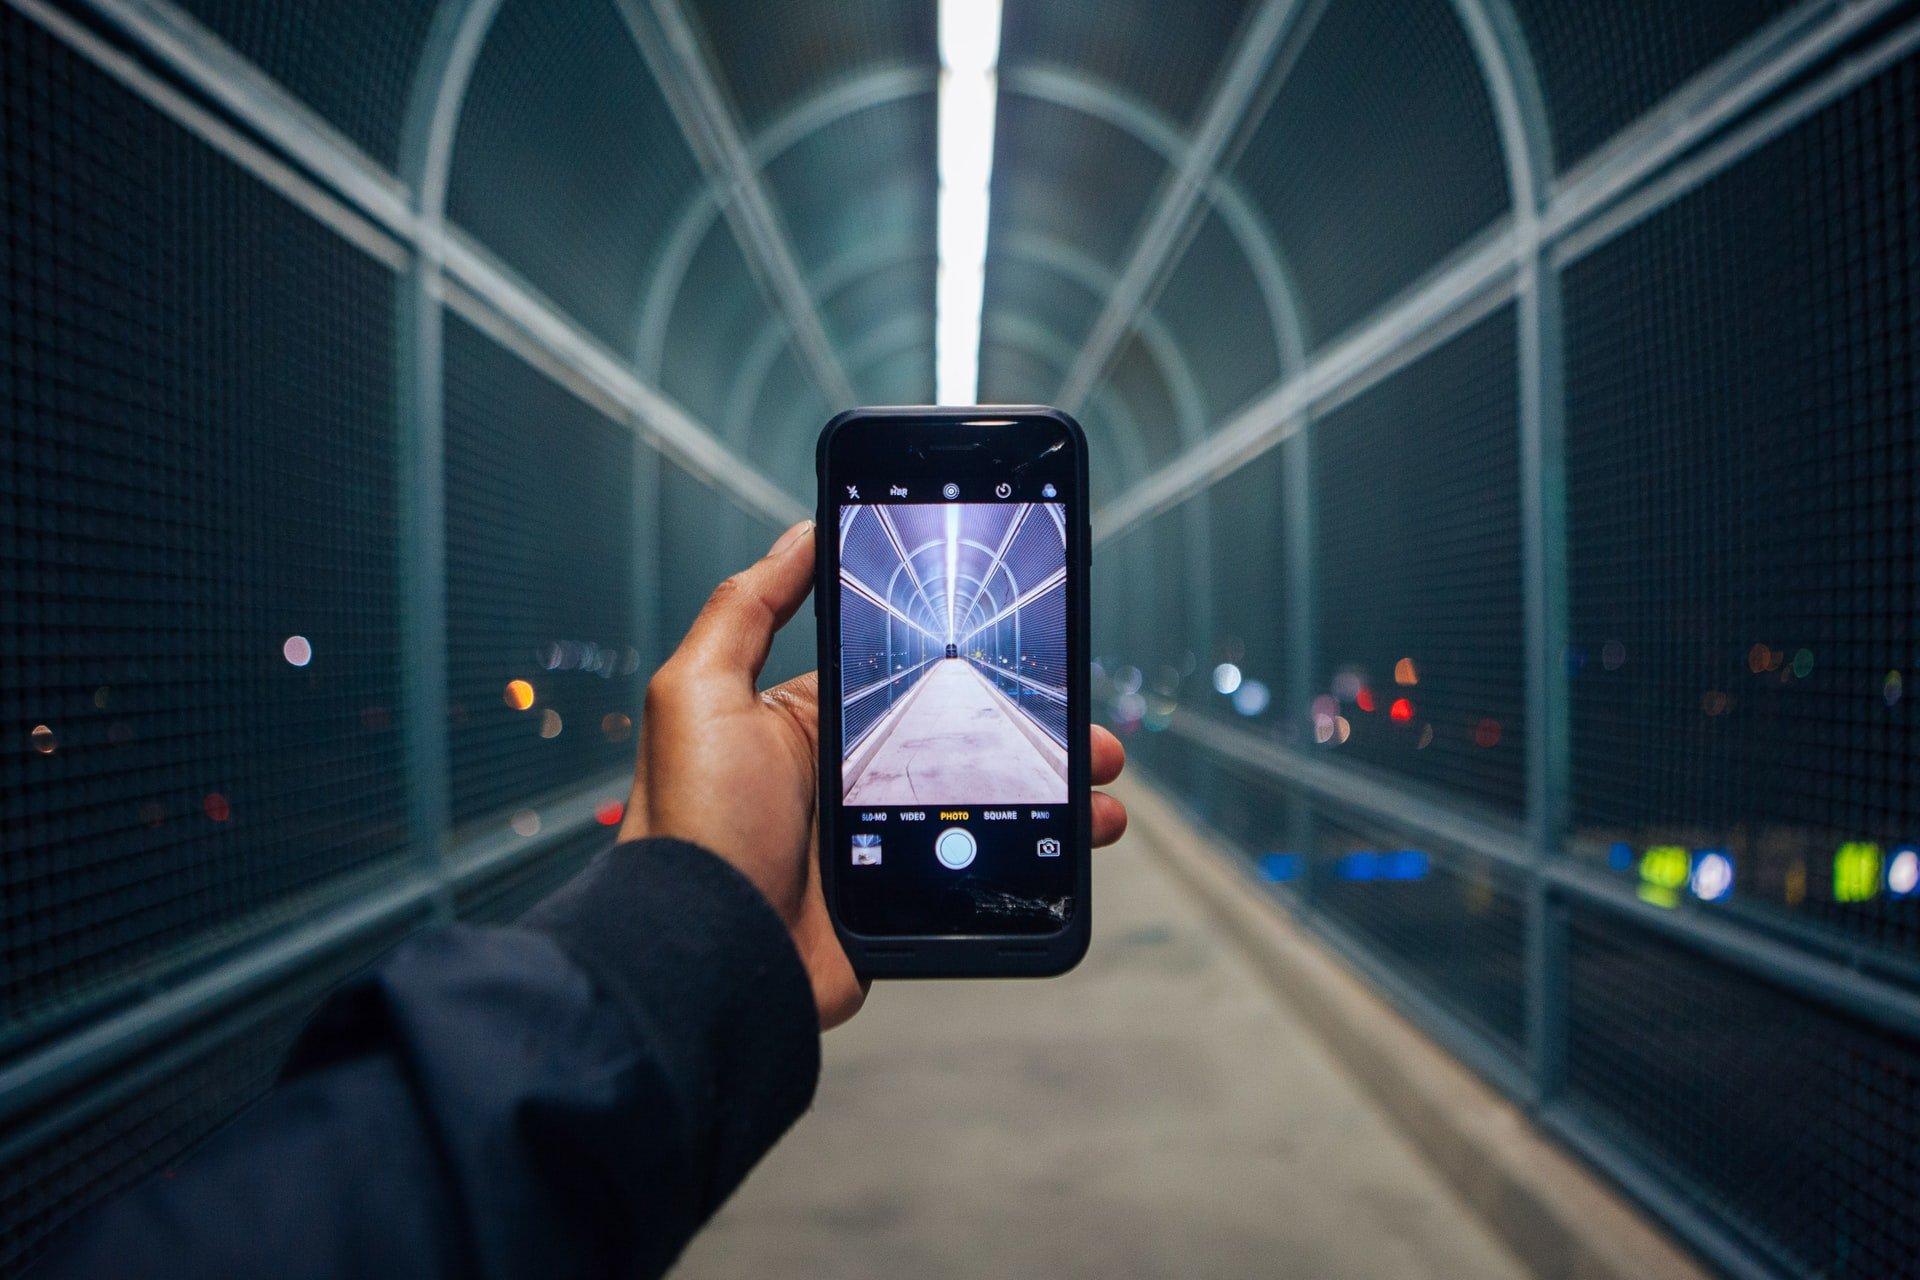 smartphone-bridge-light